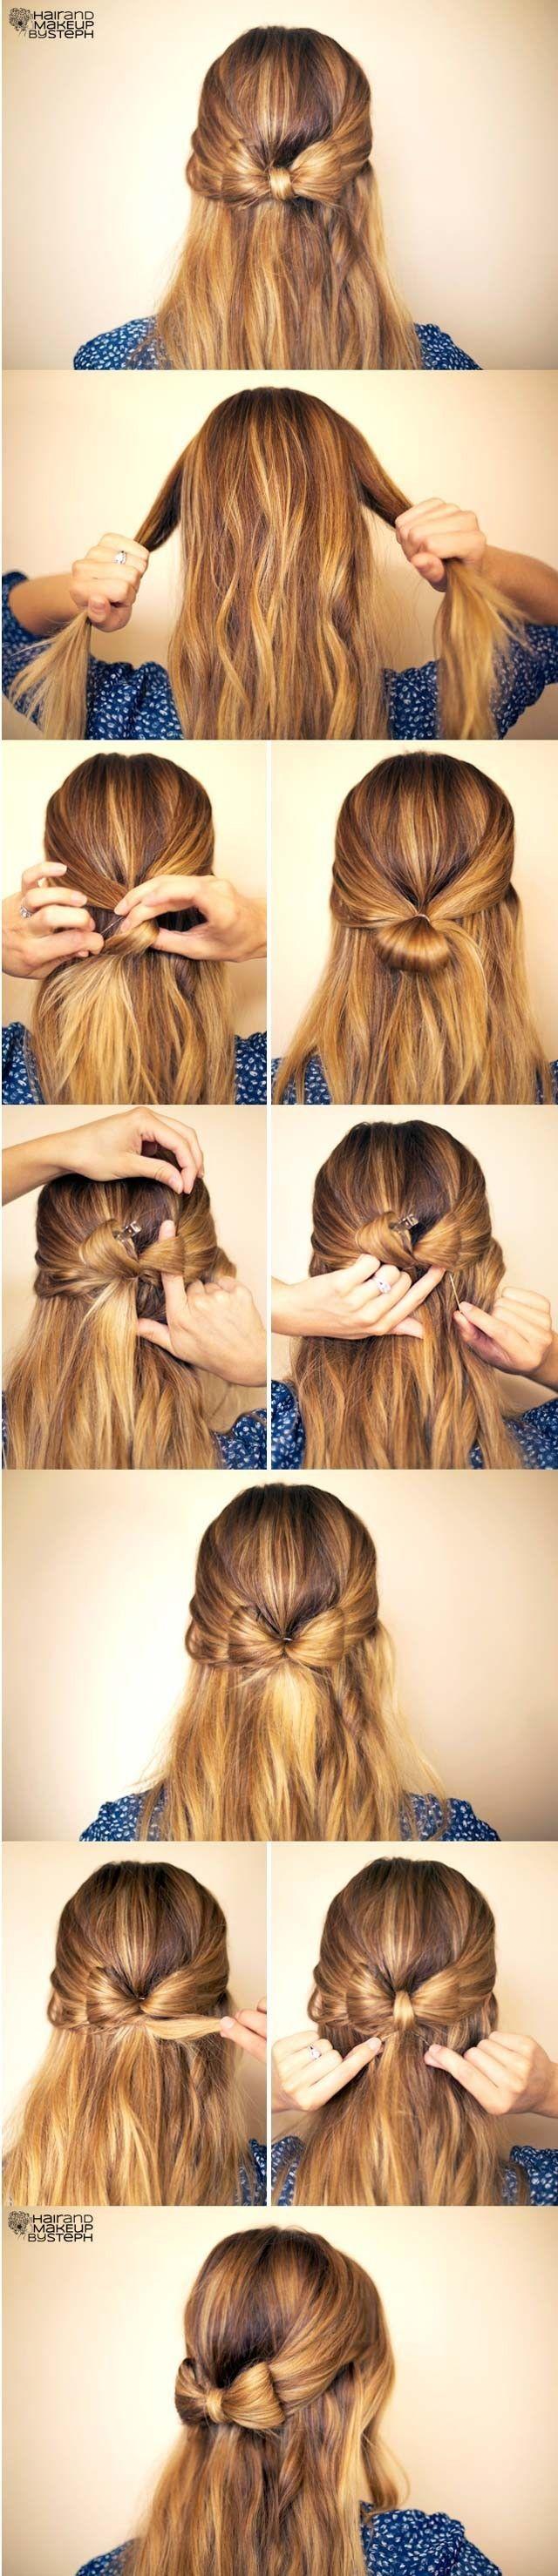 Cute Easy Hairstyle: Hair Bow Tutorial